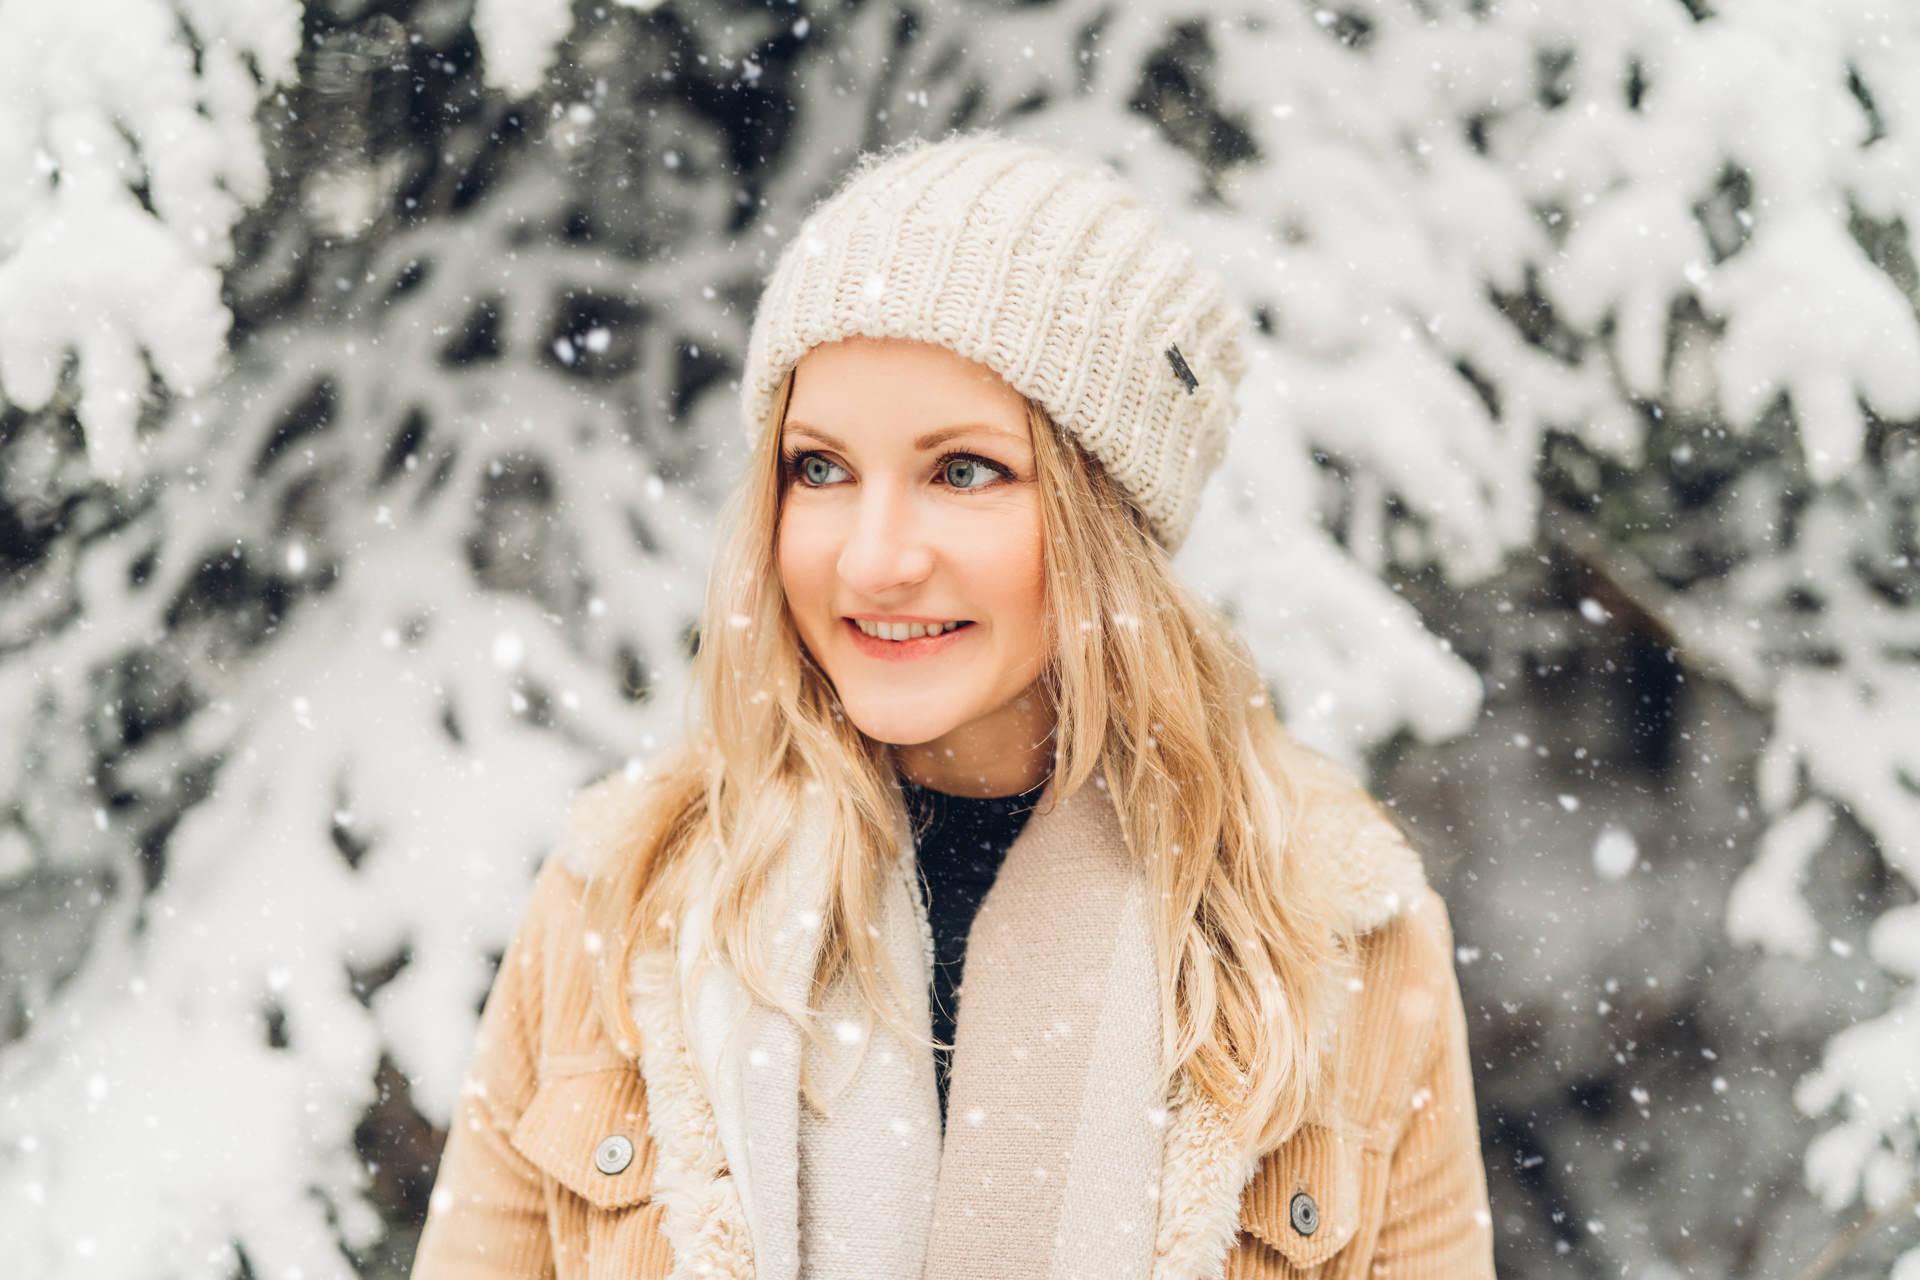 Wintershooting Portraits im Schnee